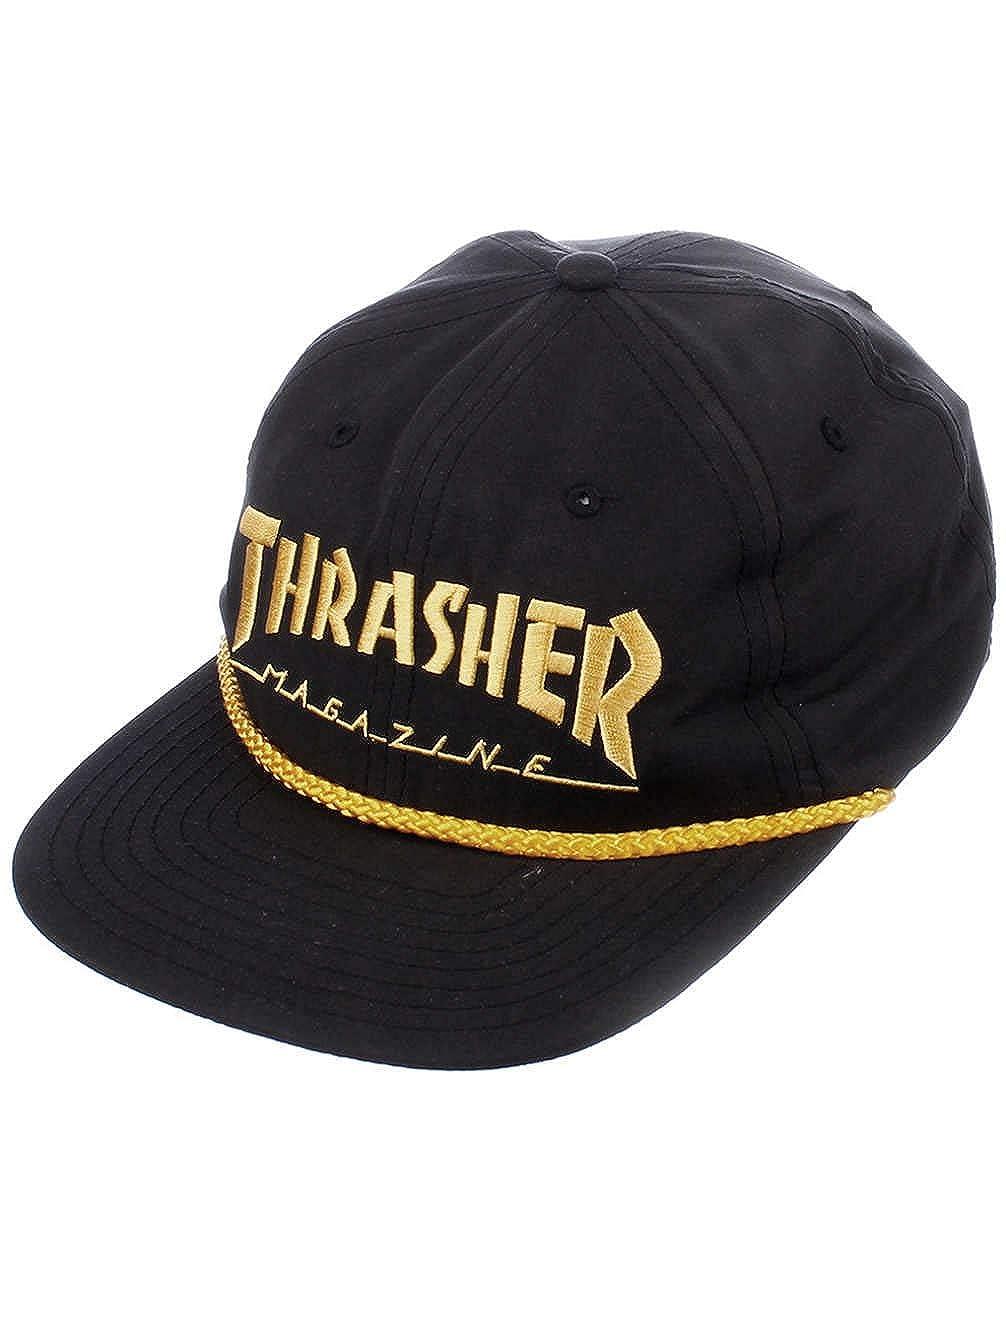 2a1eb391db1 Thrasher Rope Snapback Hat - Black Yellow at Amazon Men s Clothing store